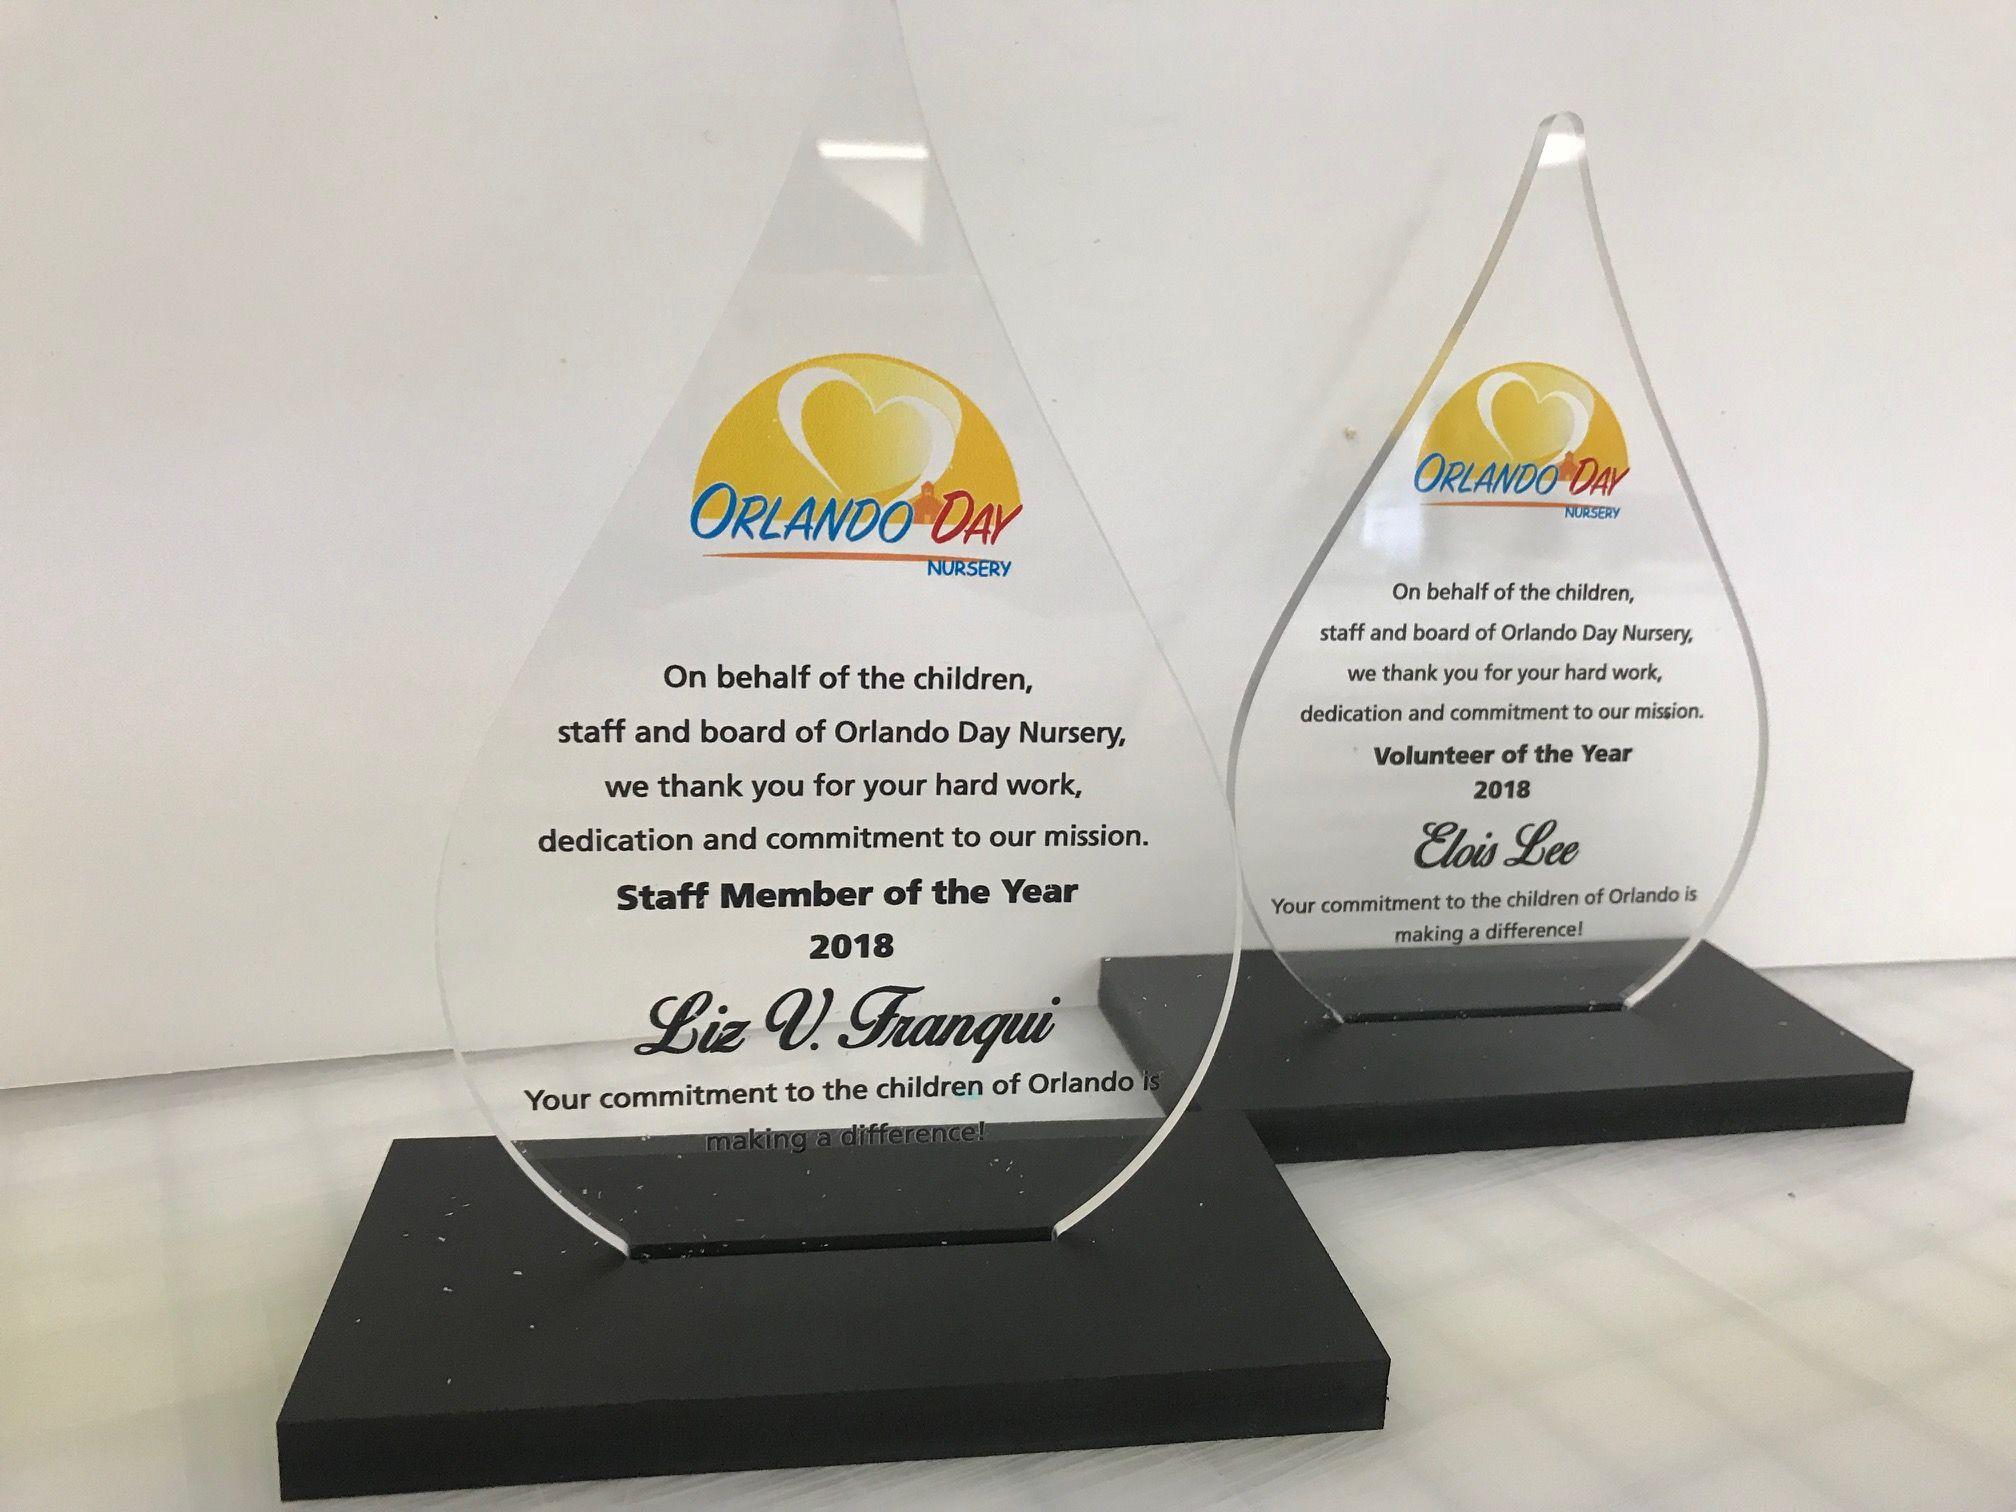 Beautiful Acrylic Awards For The Orlando Day Nursery Gala Fastsignsdidit